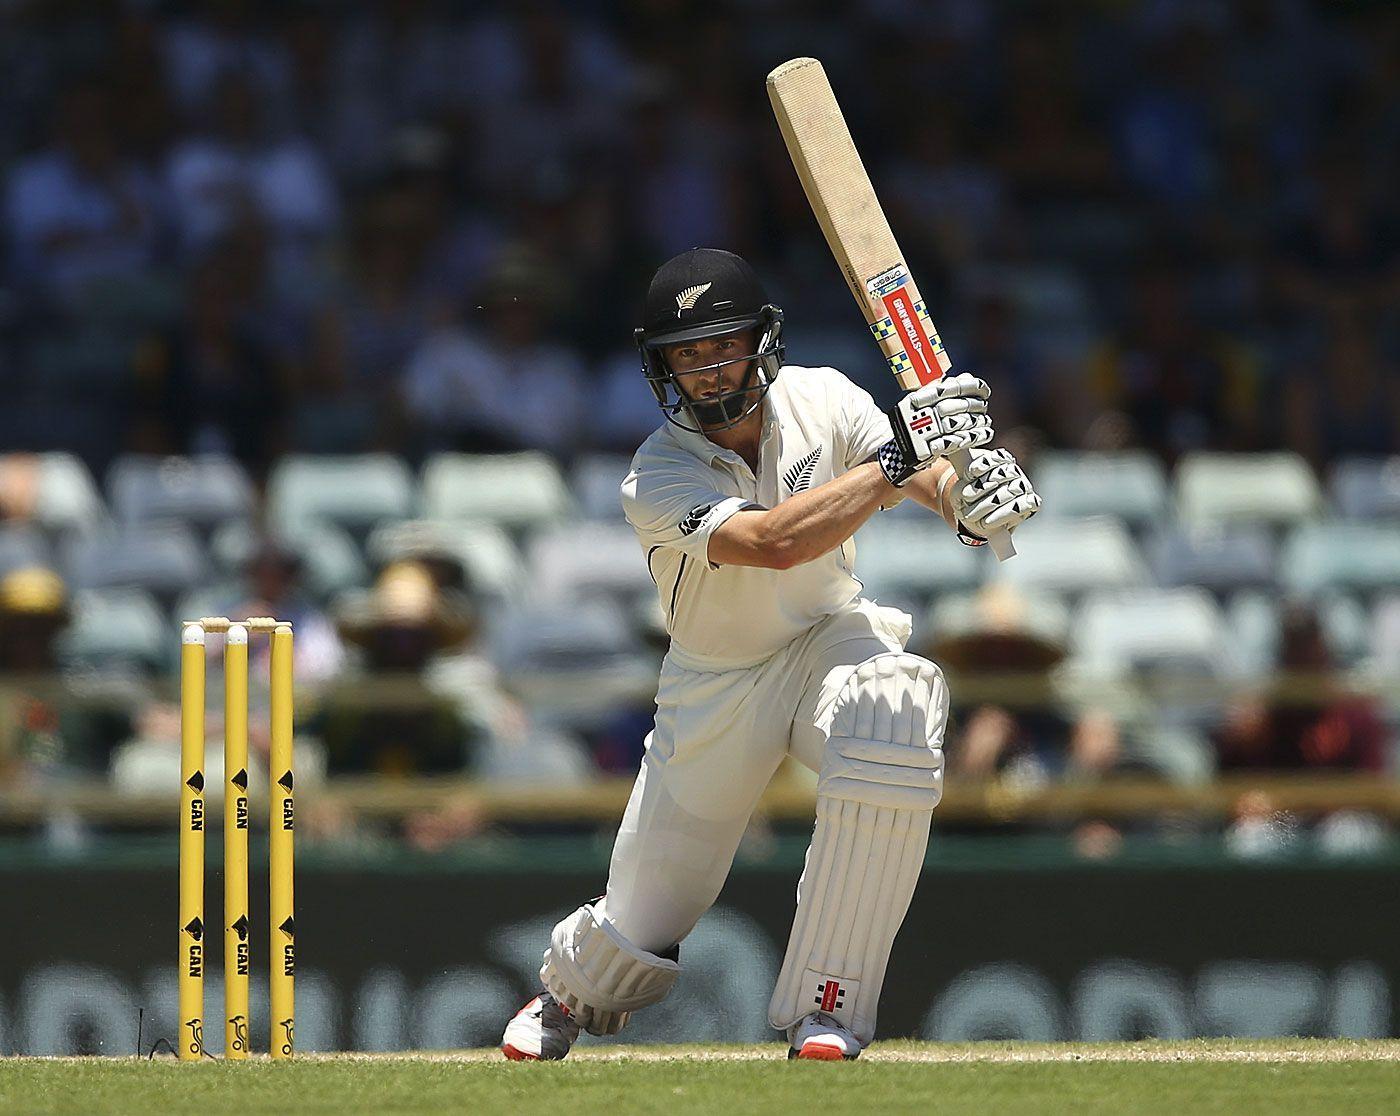 Cricket. Kane Williamson Cover drive | Cricket wallpapers, Kane williamson, Cricket